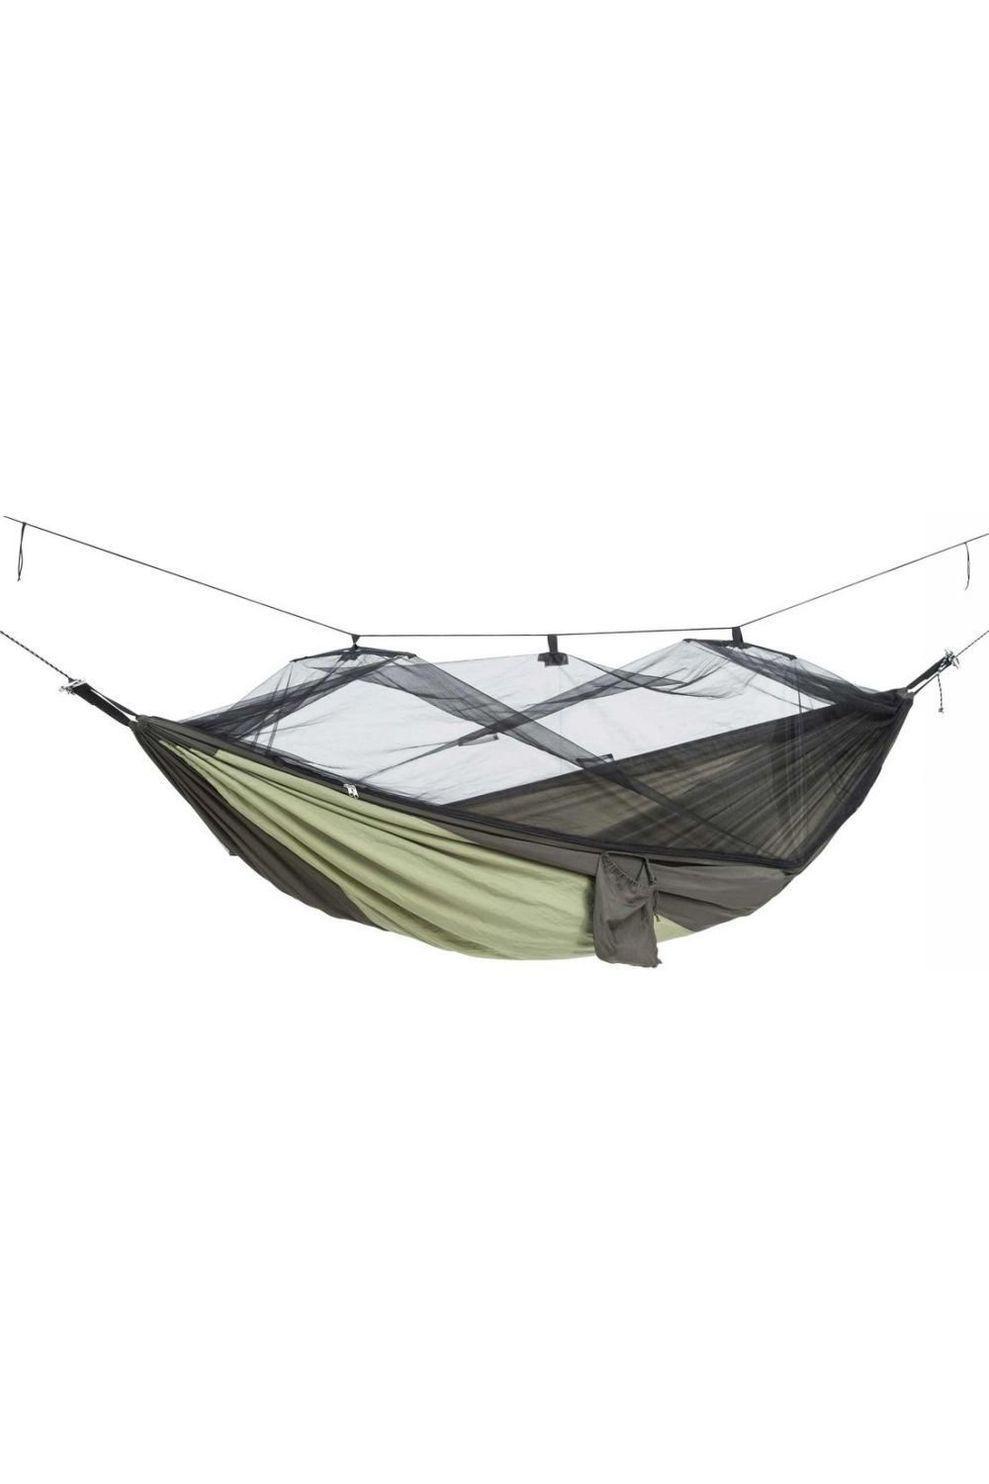 Amazonas Hangmat Moskito Traveller Thermo - Grijs/Groen